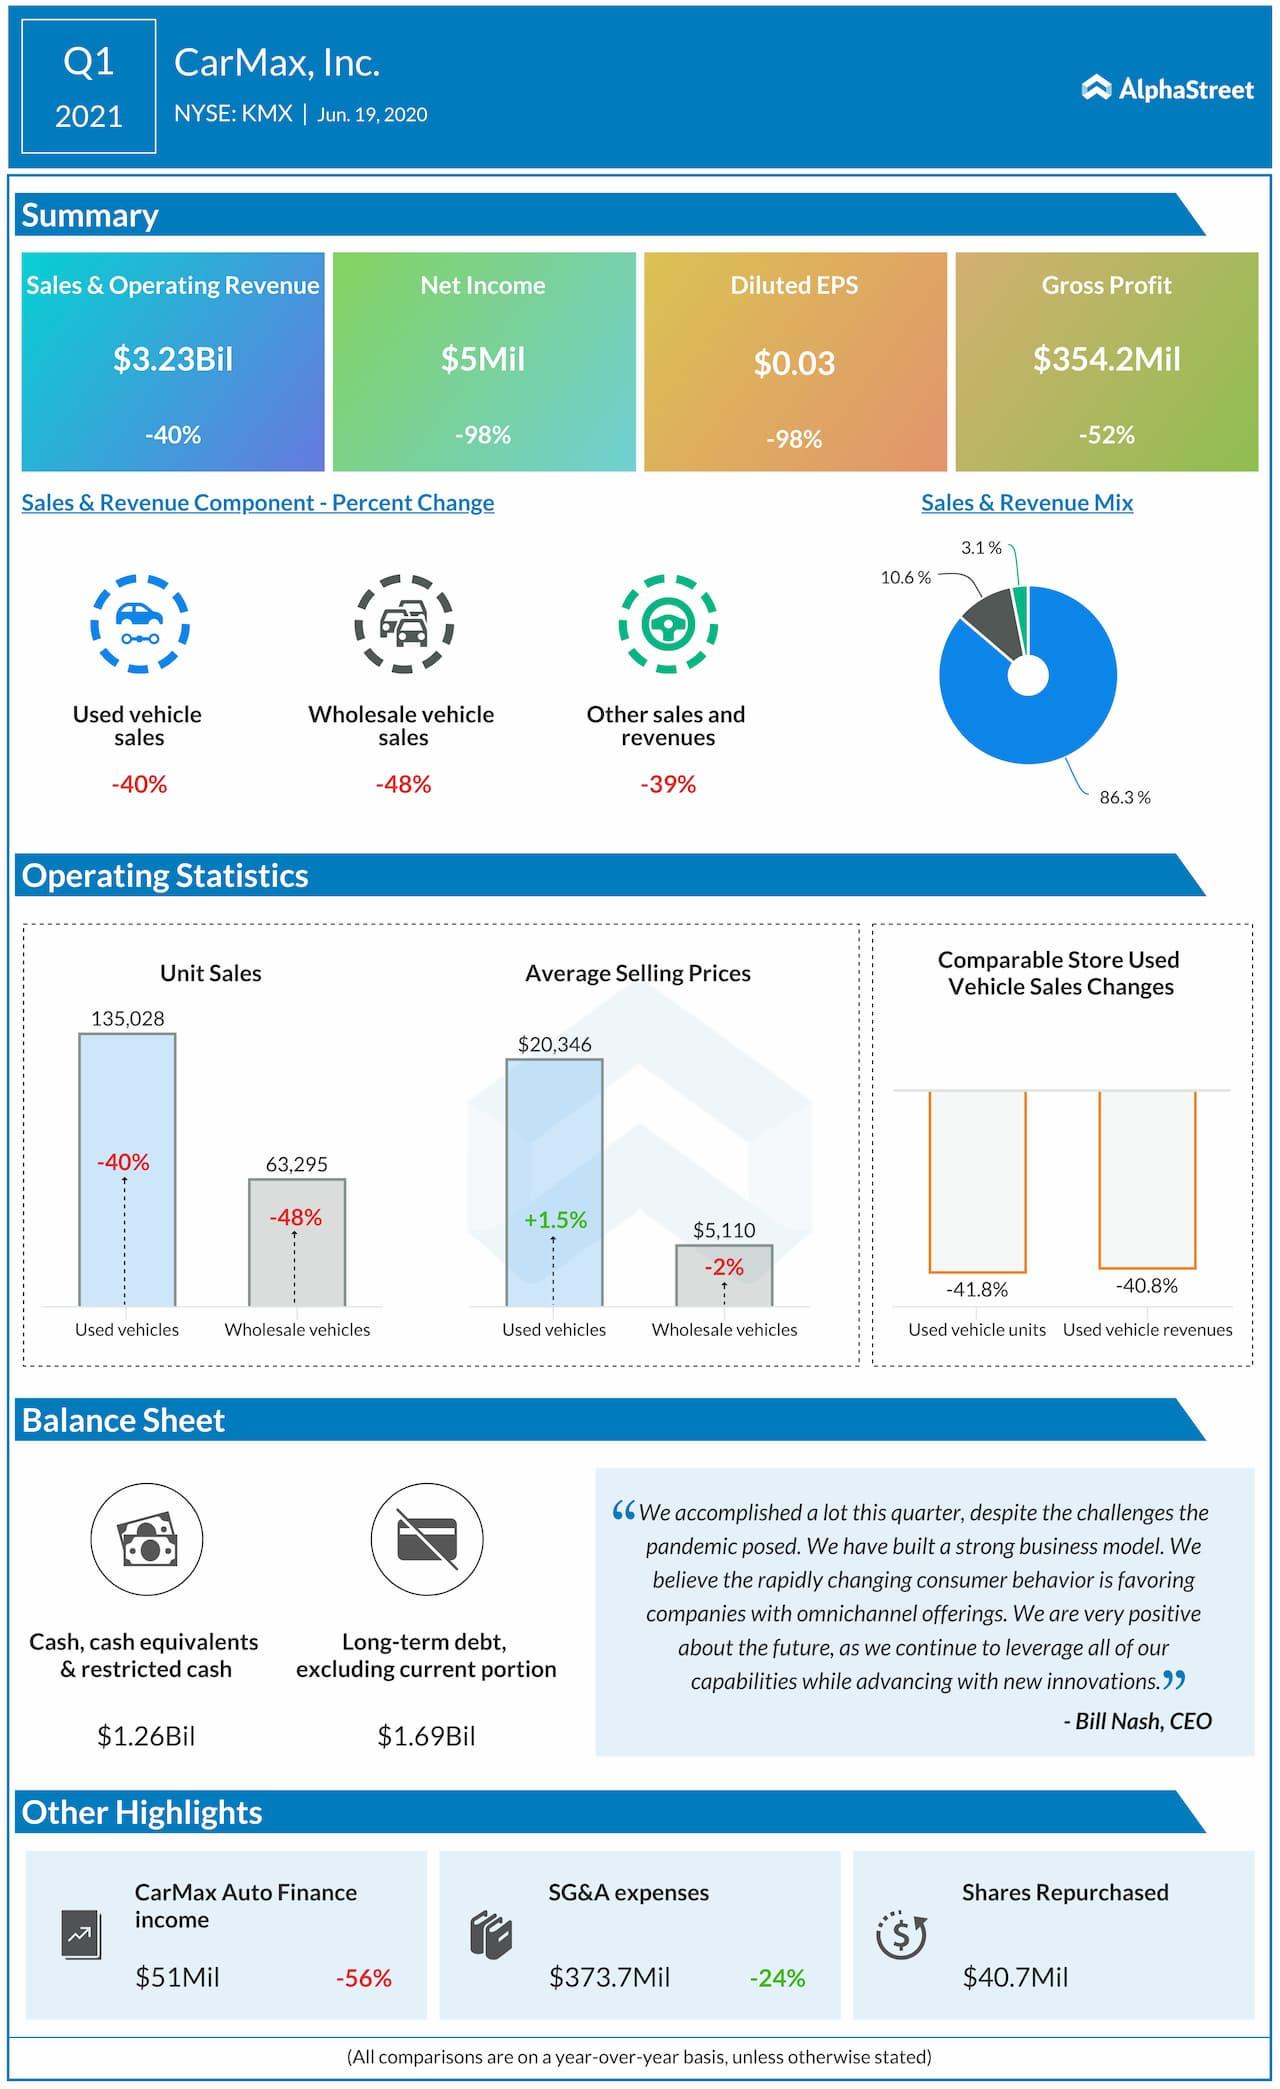 CarMax (KMX) Reports Q1 2021 Earnings